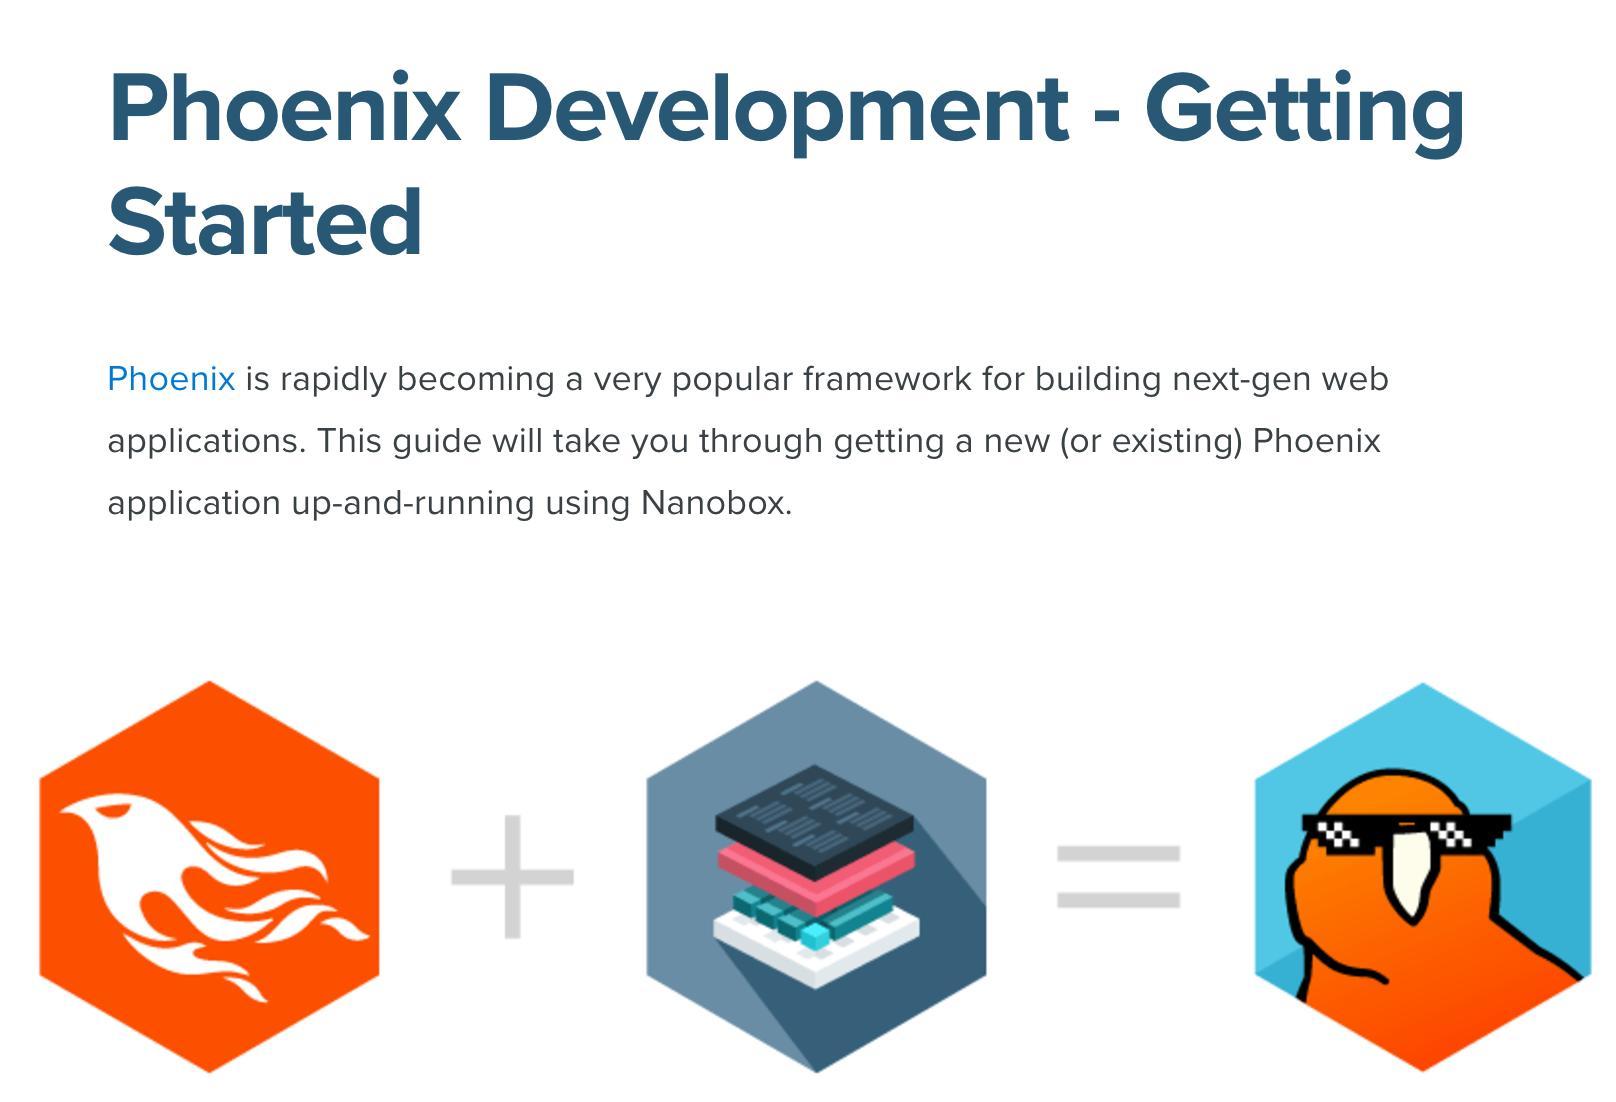 Phoenix & Nanobox - Getting Started Tutorial - Guides / Tips